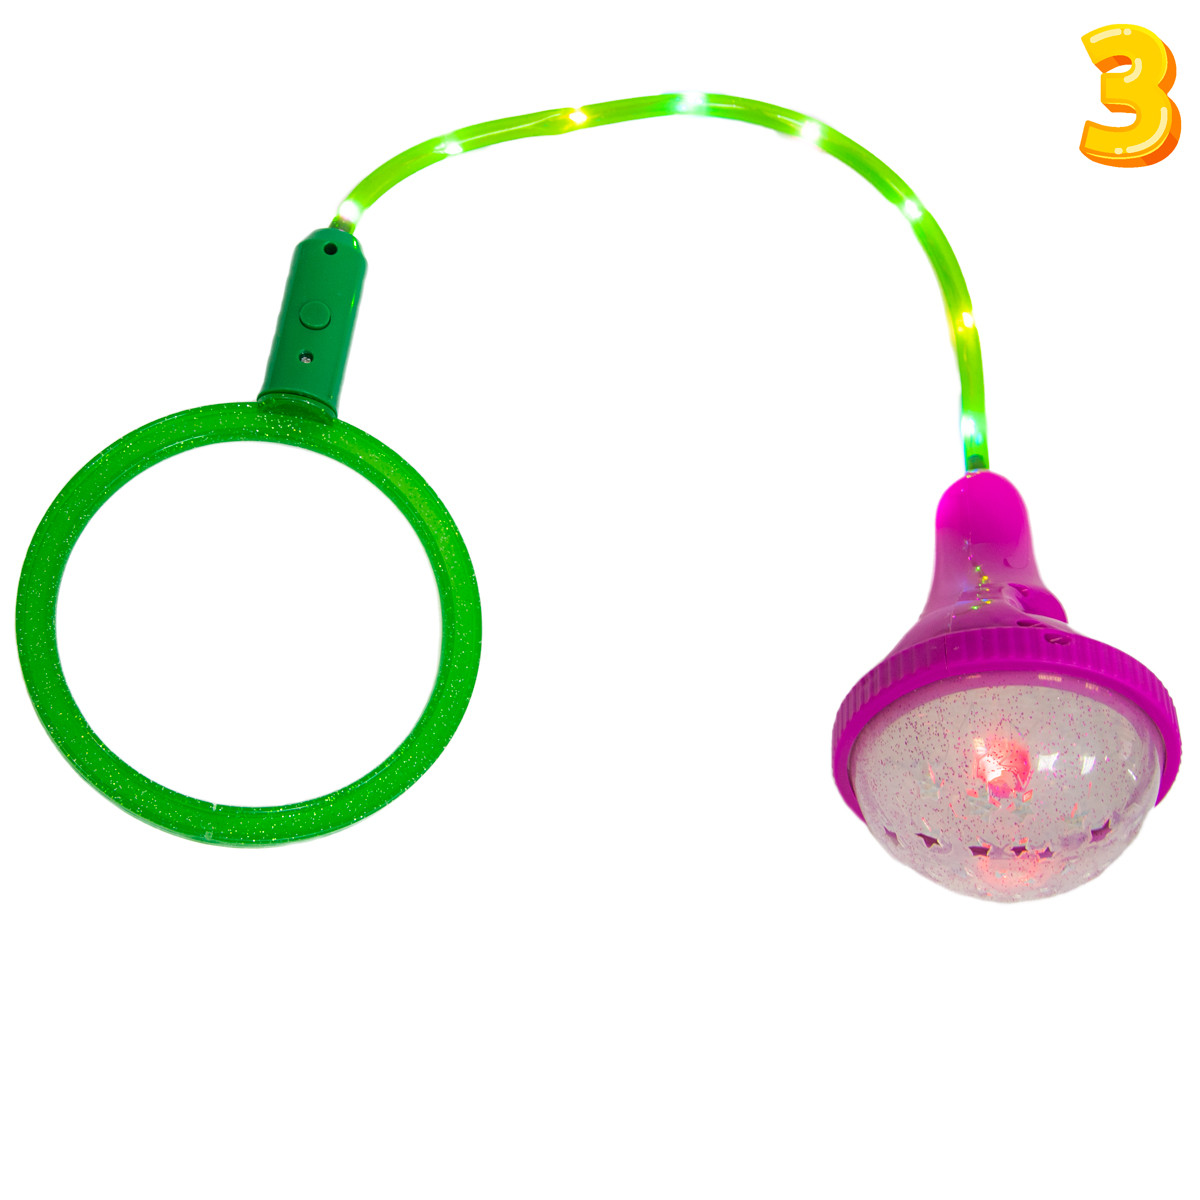 Скакалка блимаюча на одну ногу Ice Hoop - Малиновий ліхтарик та Зелений круг №3, нейроскакалка дитяча